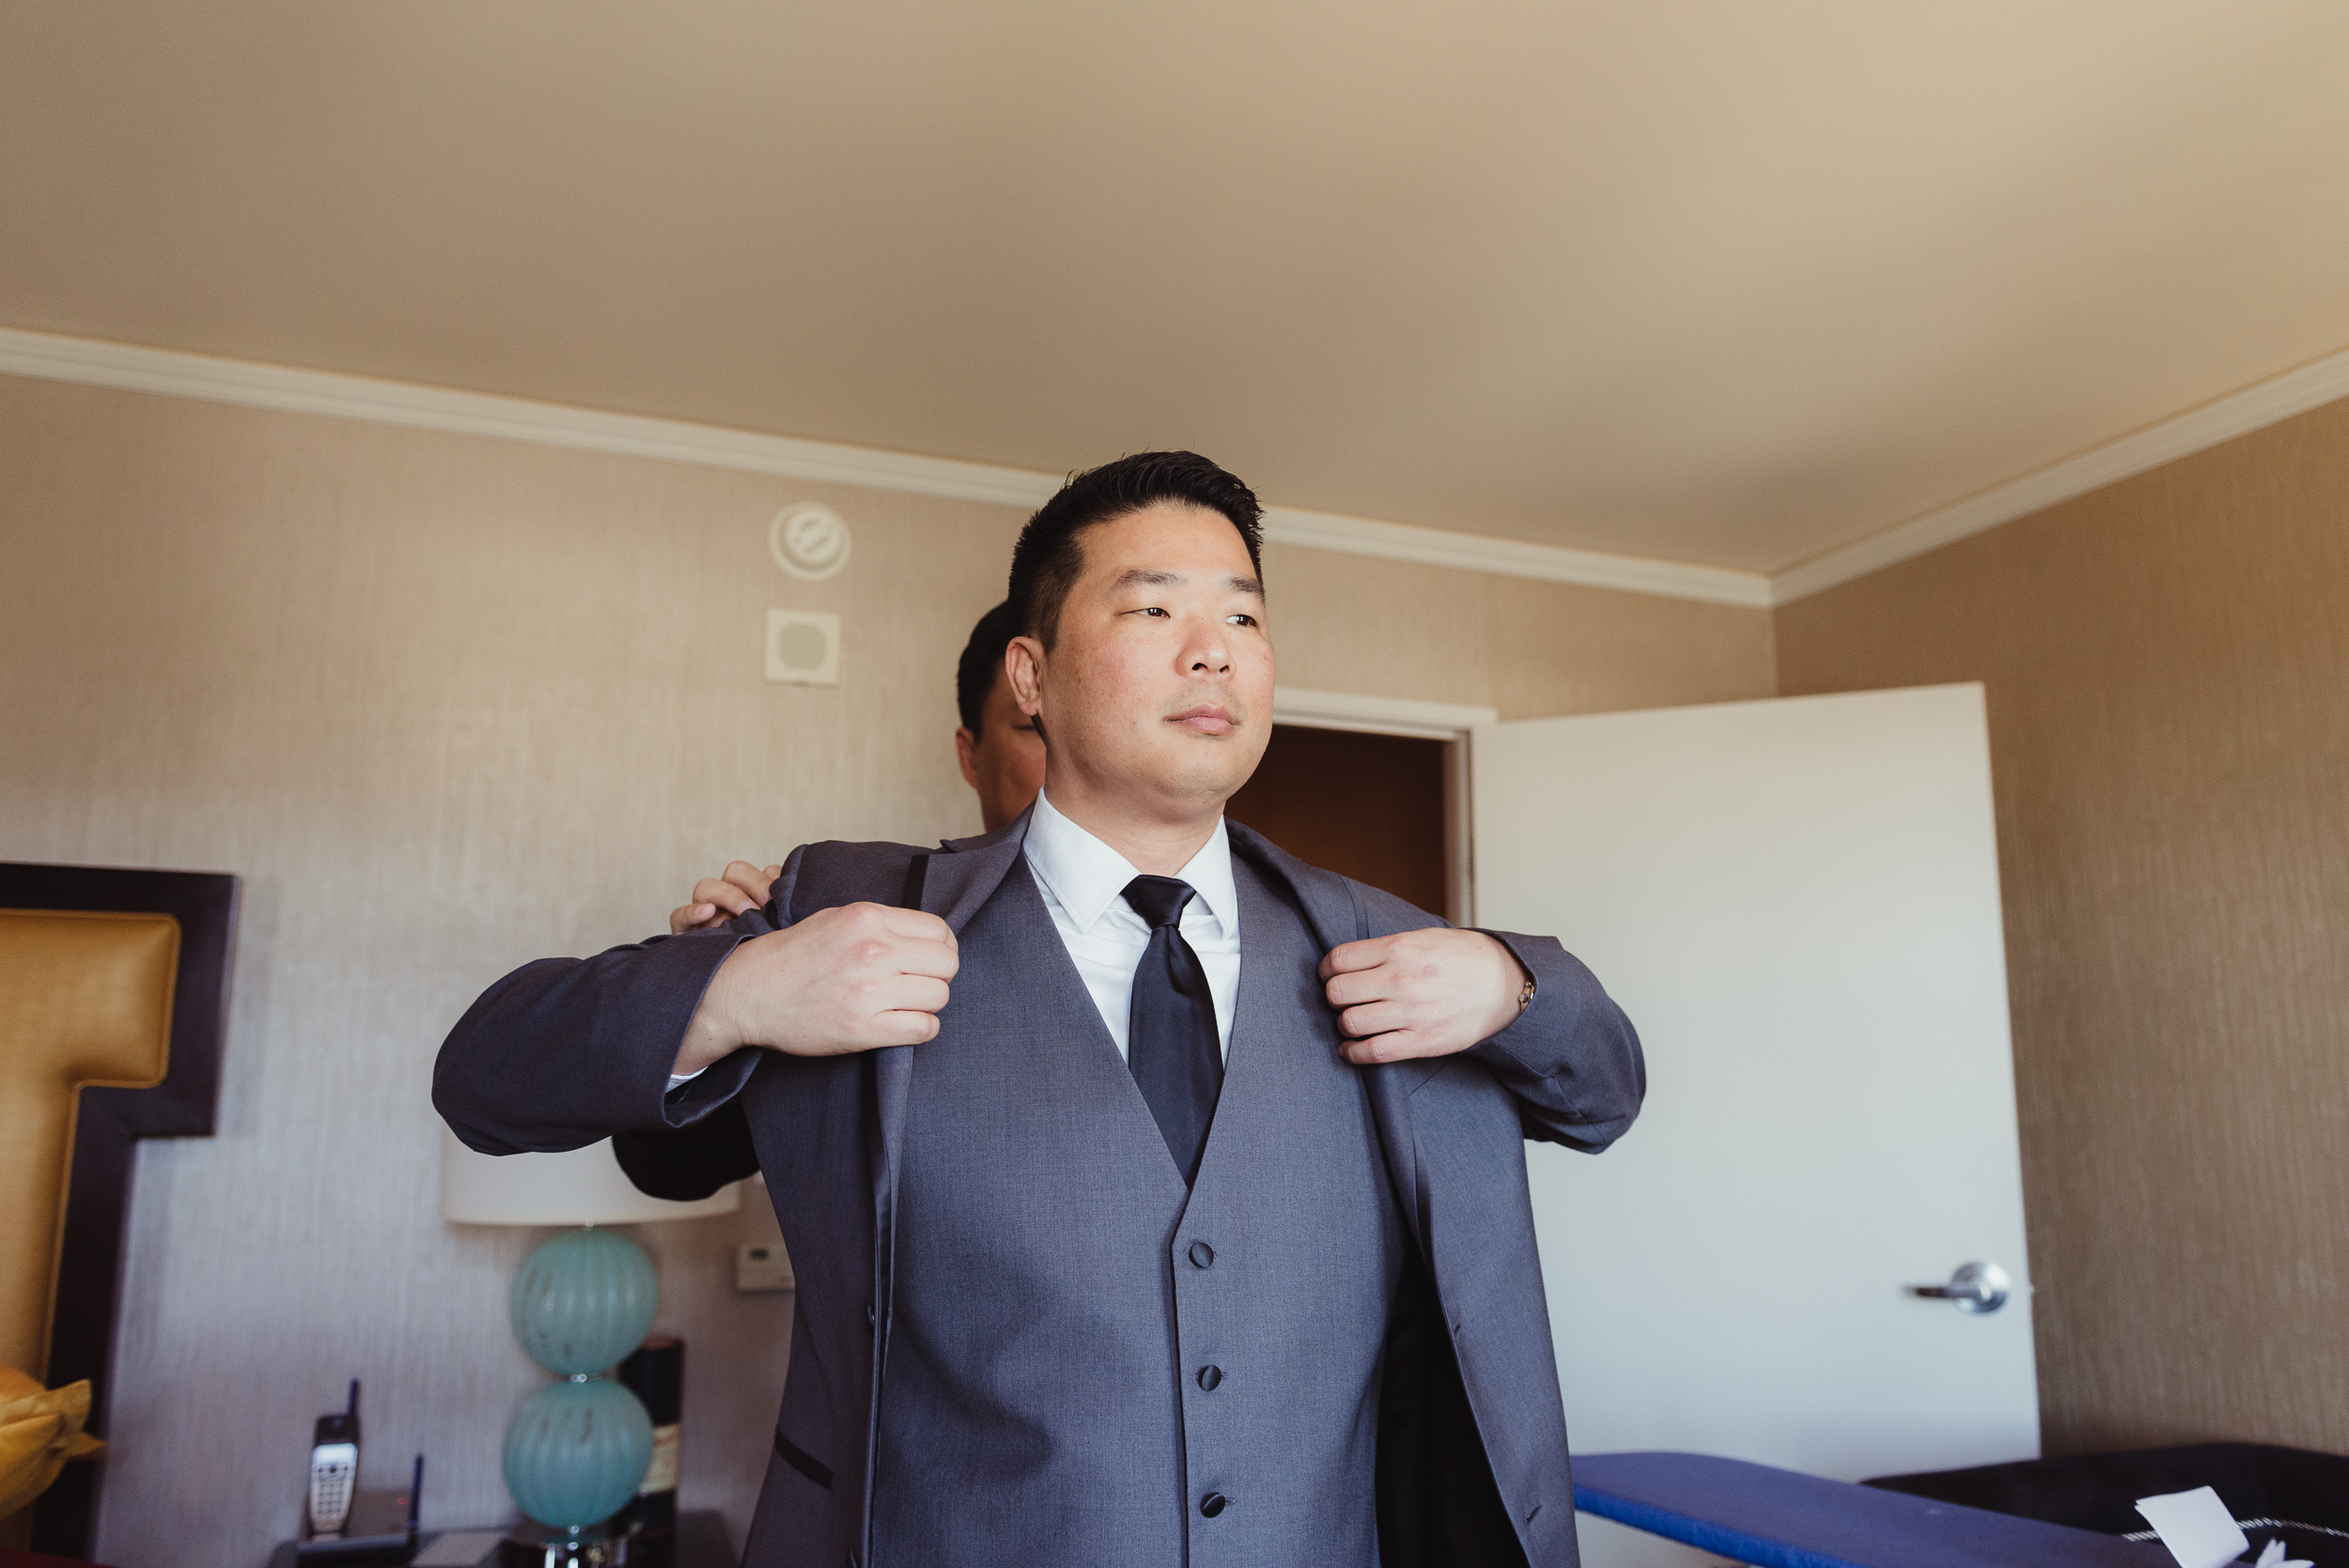 06-saratoga-country-club-wedding-vivianchen-099.jpg